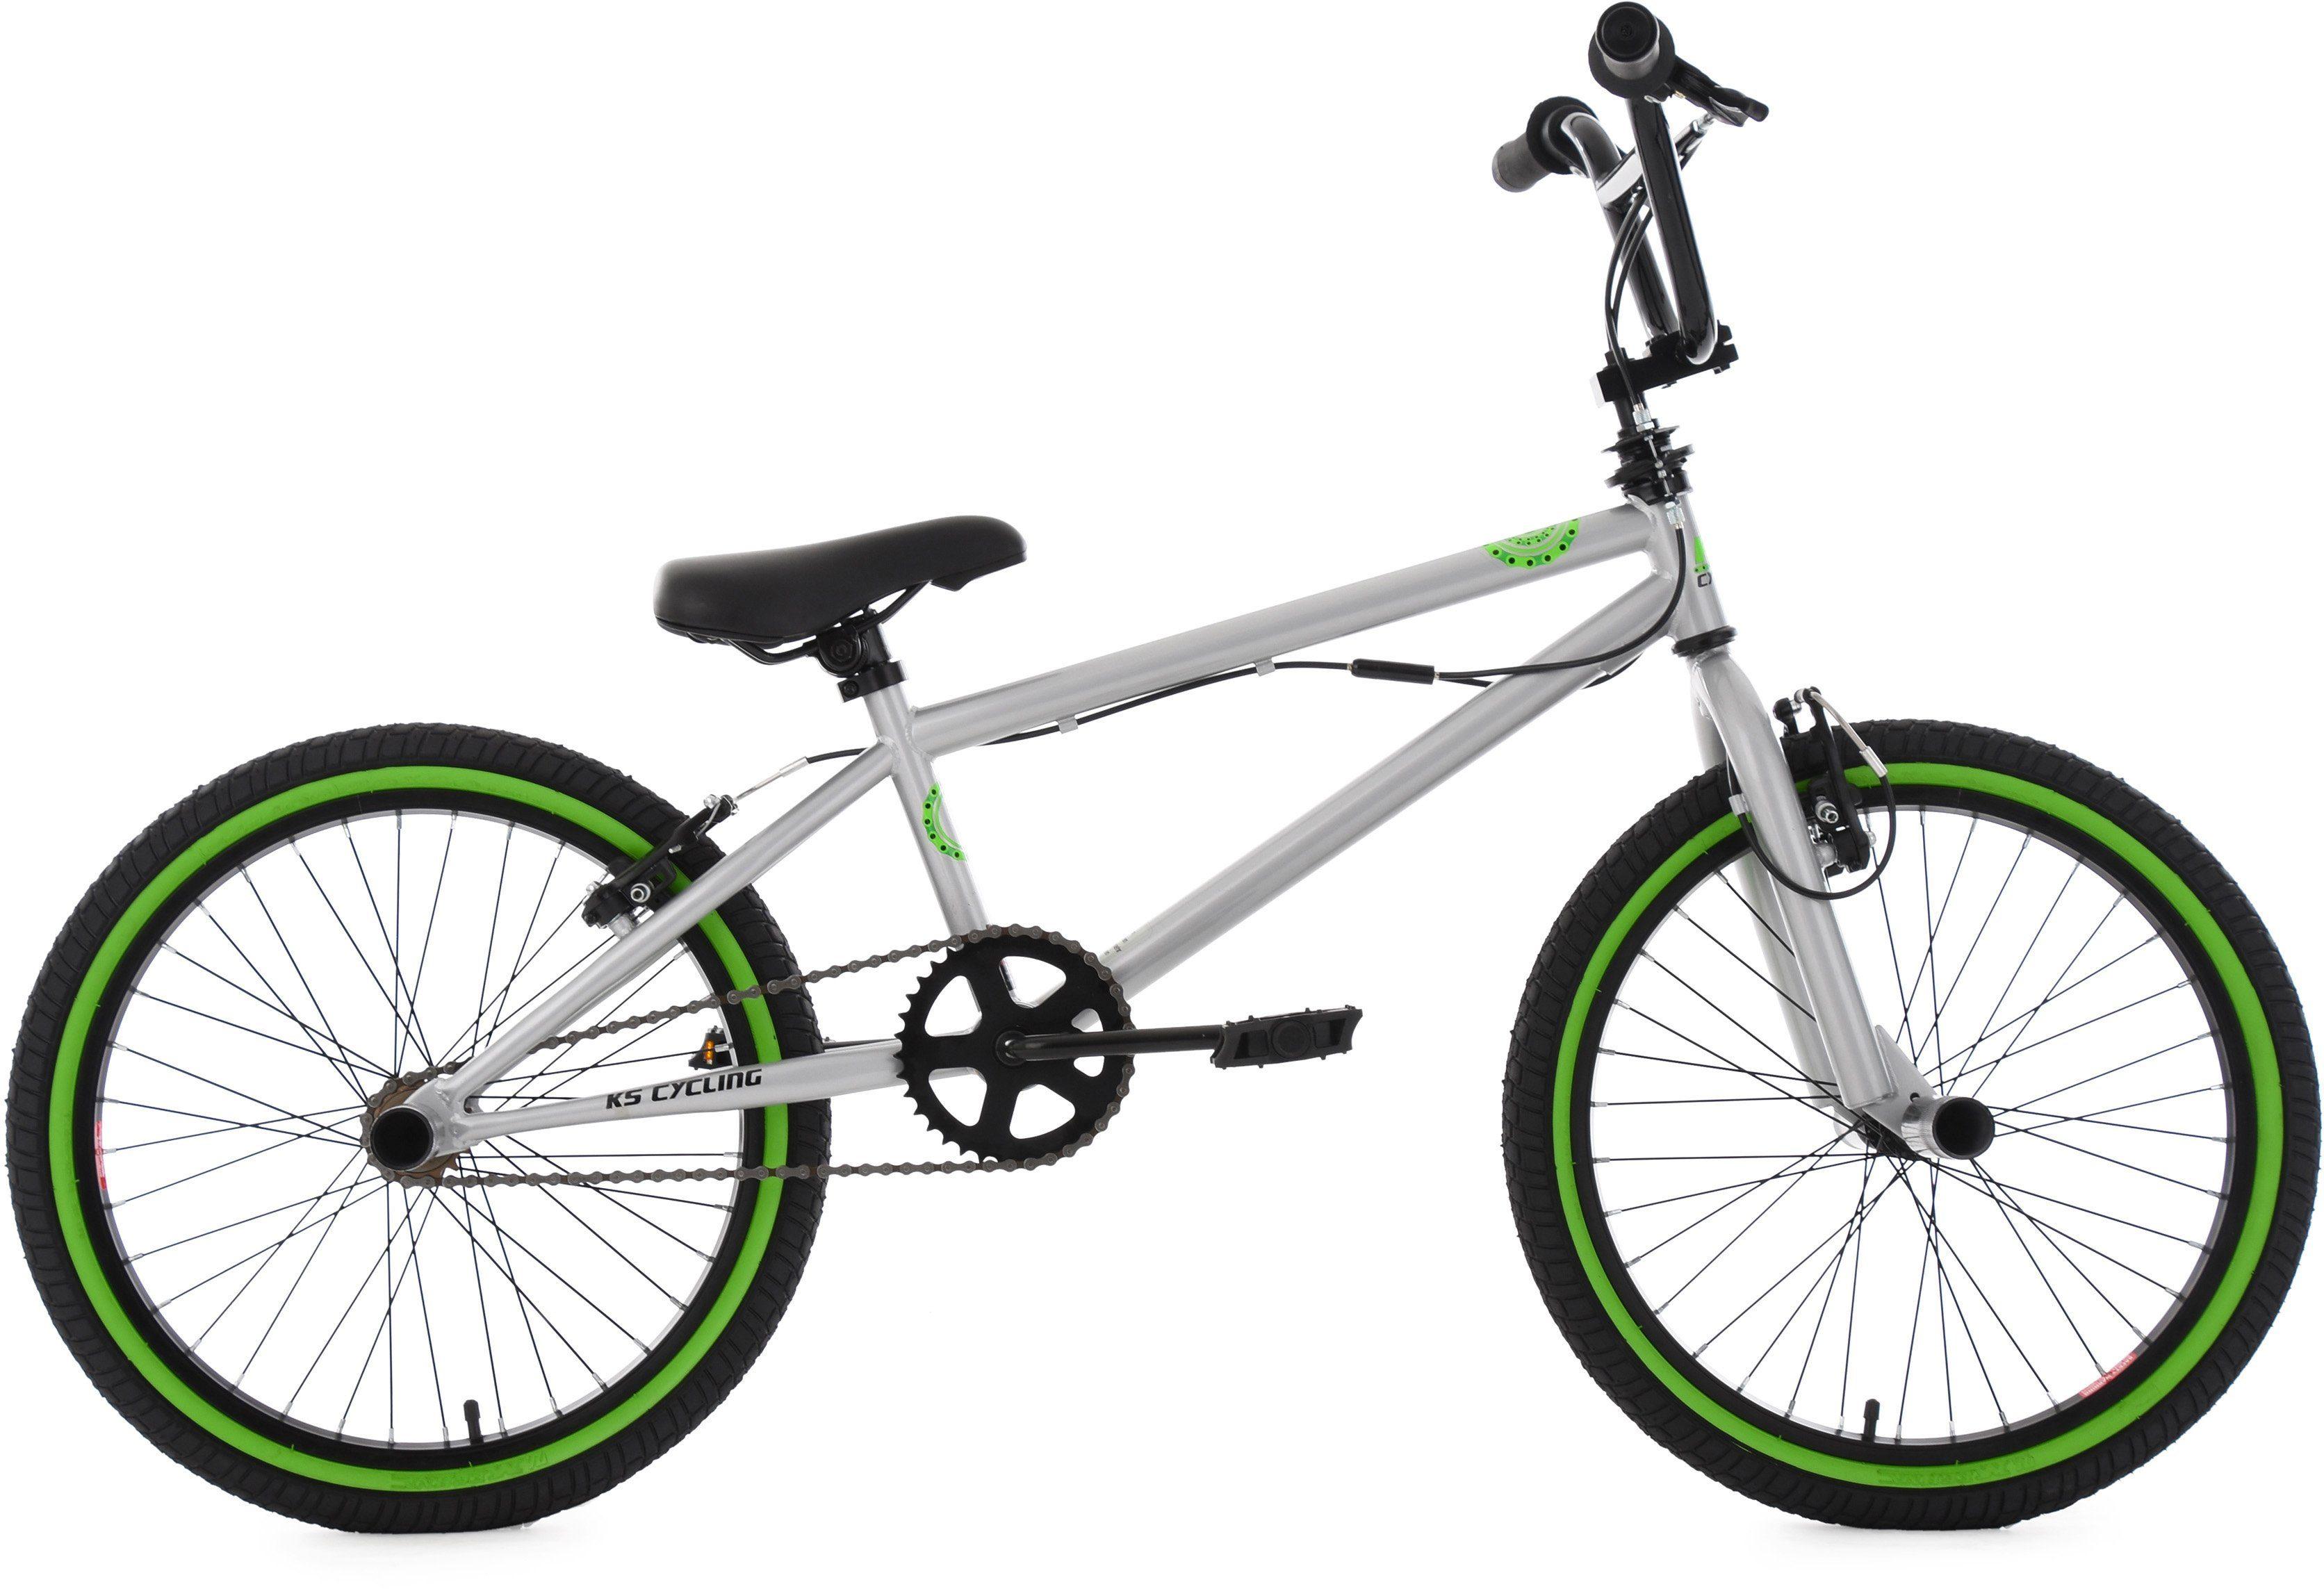 KS Cycling BMX Fahrrad, 20 Zoll, silberfarben-grün, »CRXX«